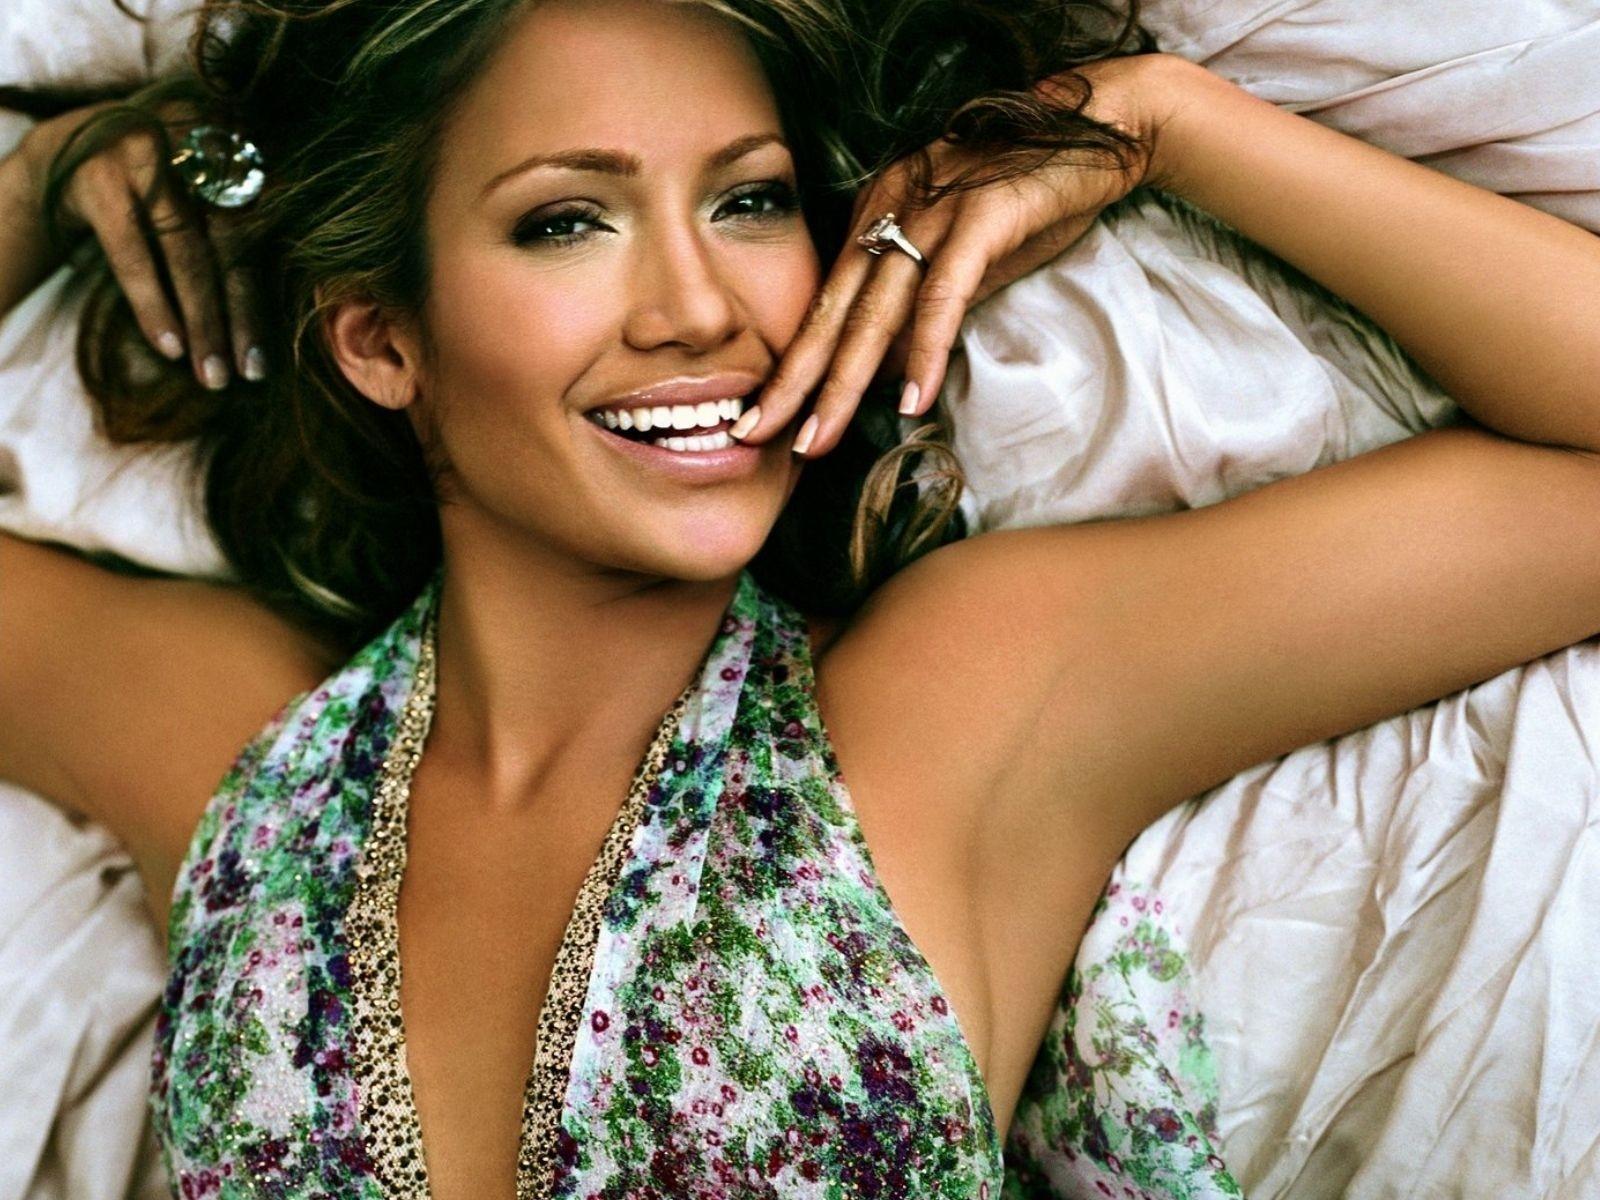 Wallpaper di Jennifer Lopez in versione glamour